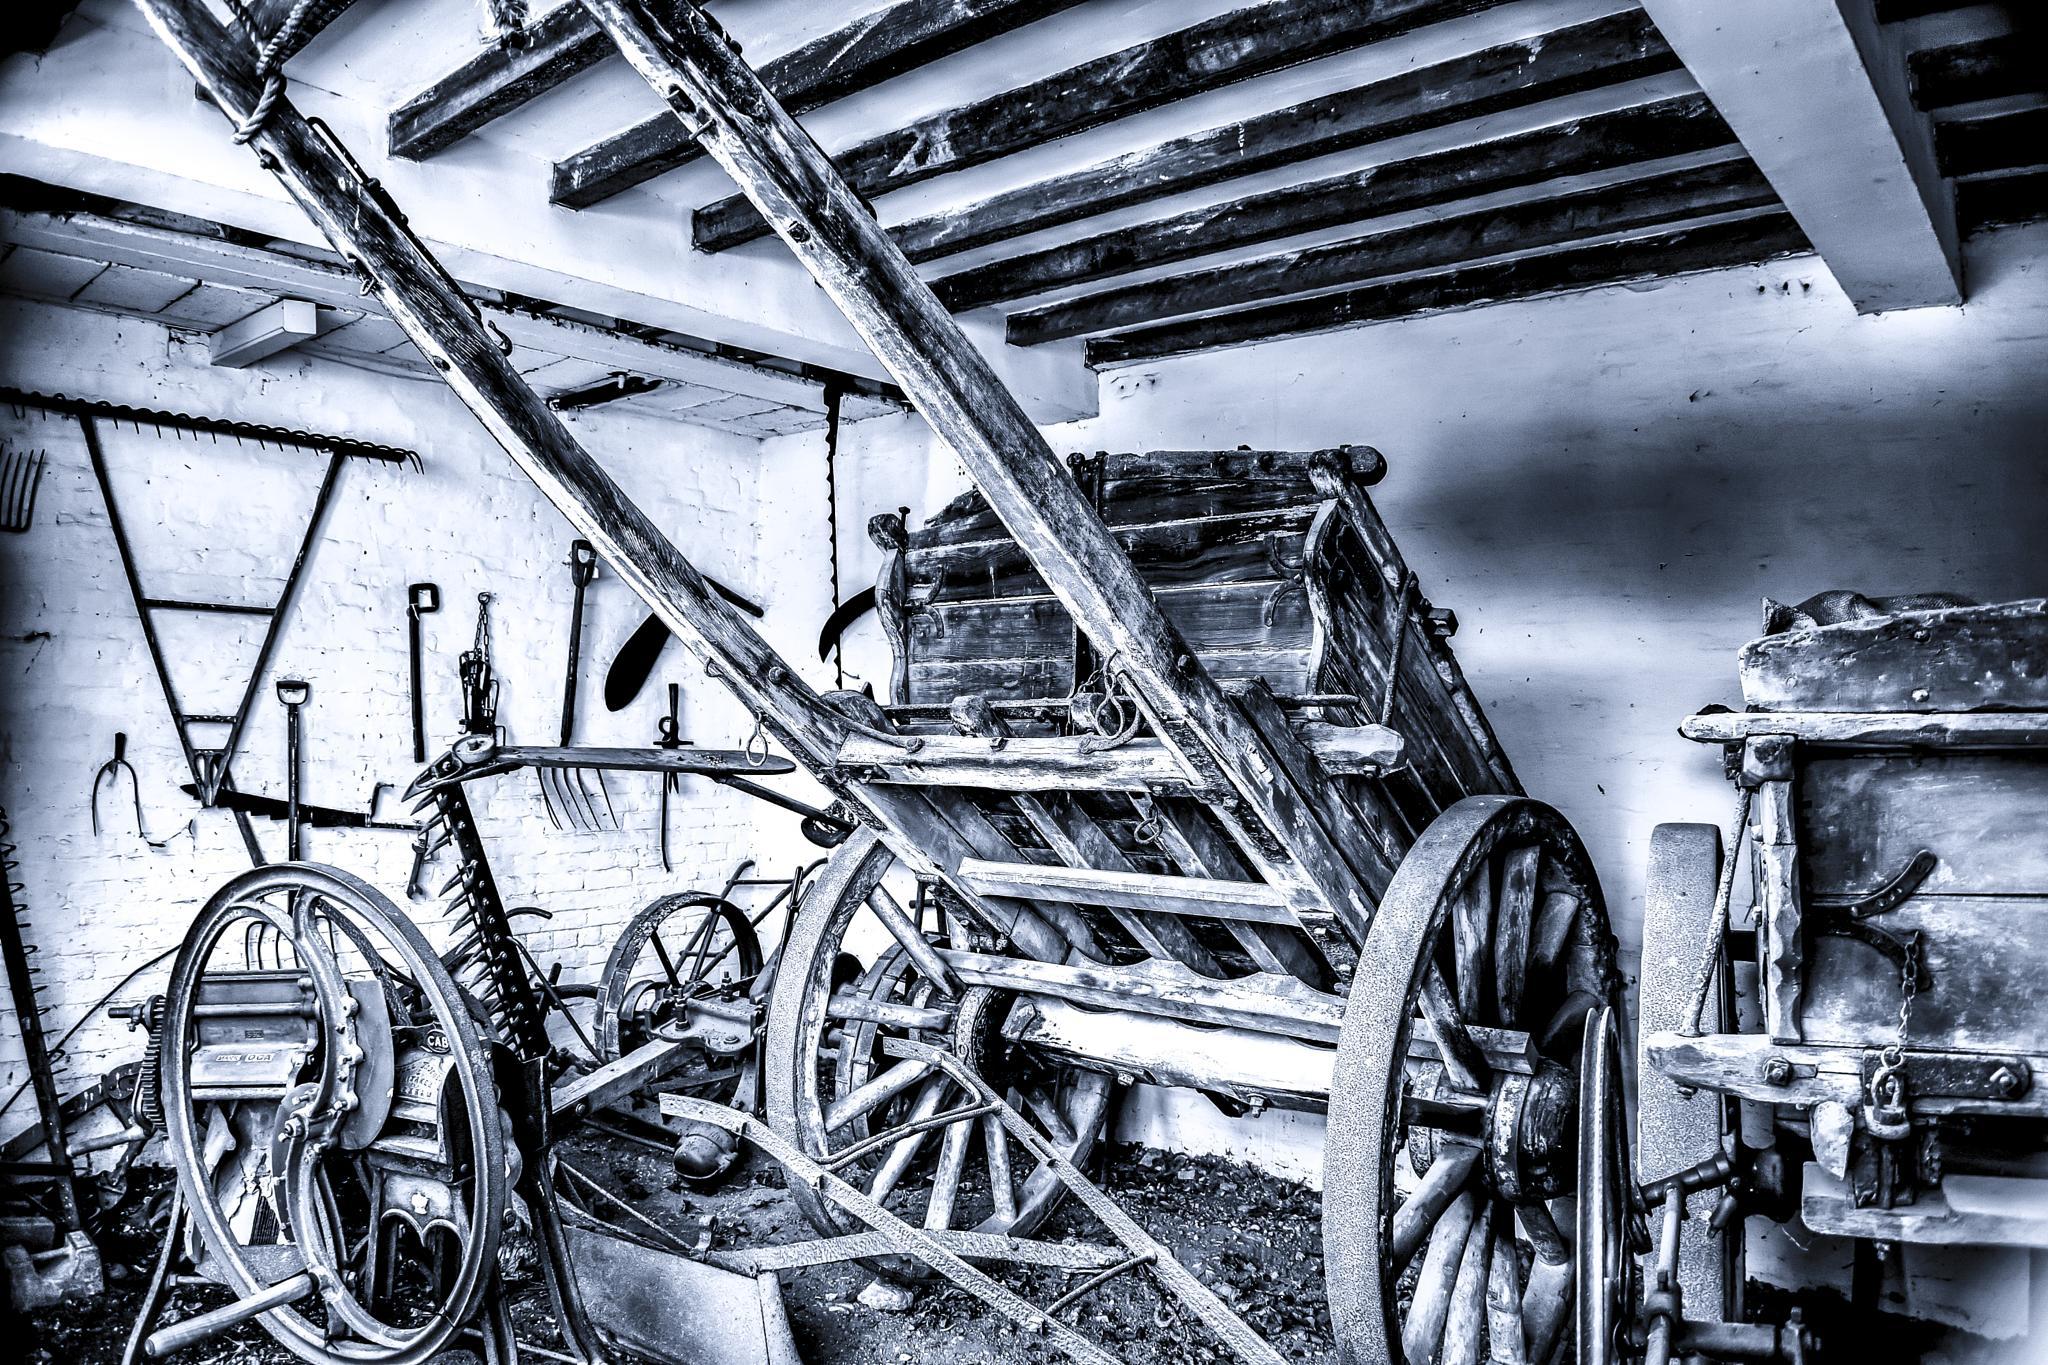 Horseless cart  by ILoveThatPhoto.co.uk